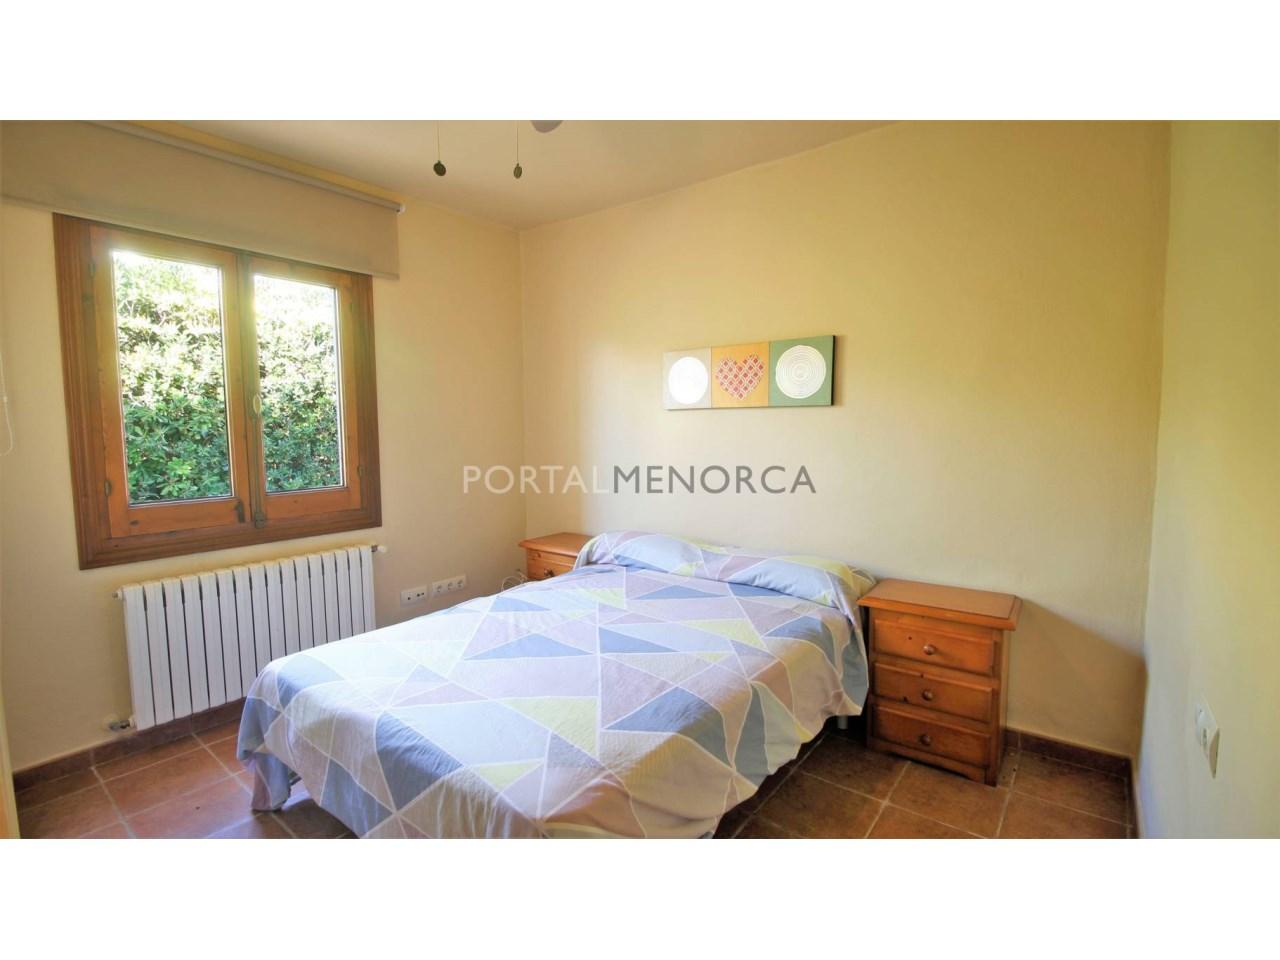 Re_ 11 dormitorio 4 (1)